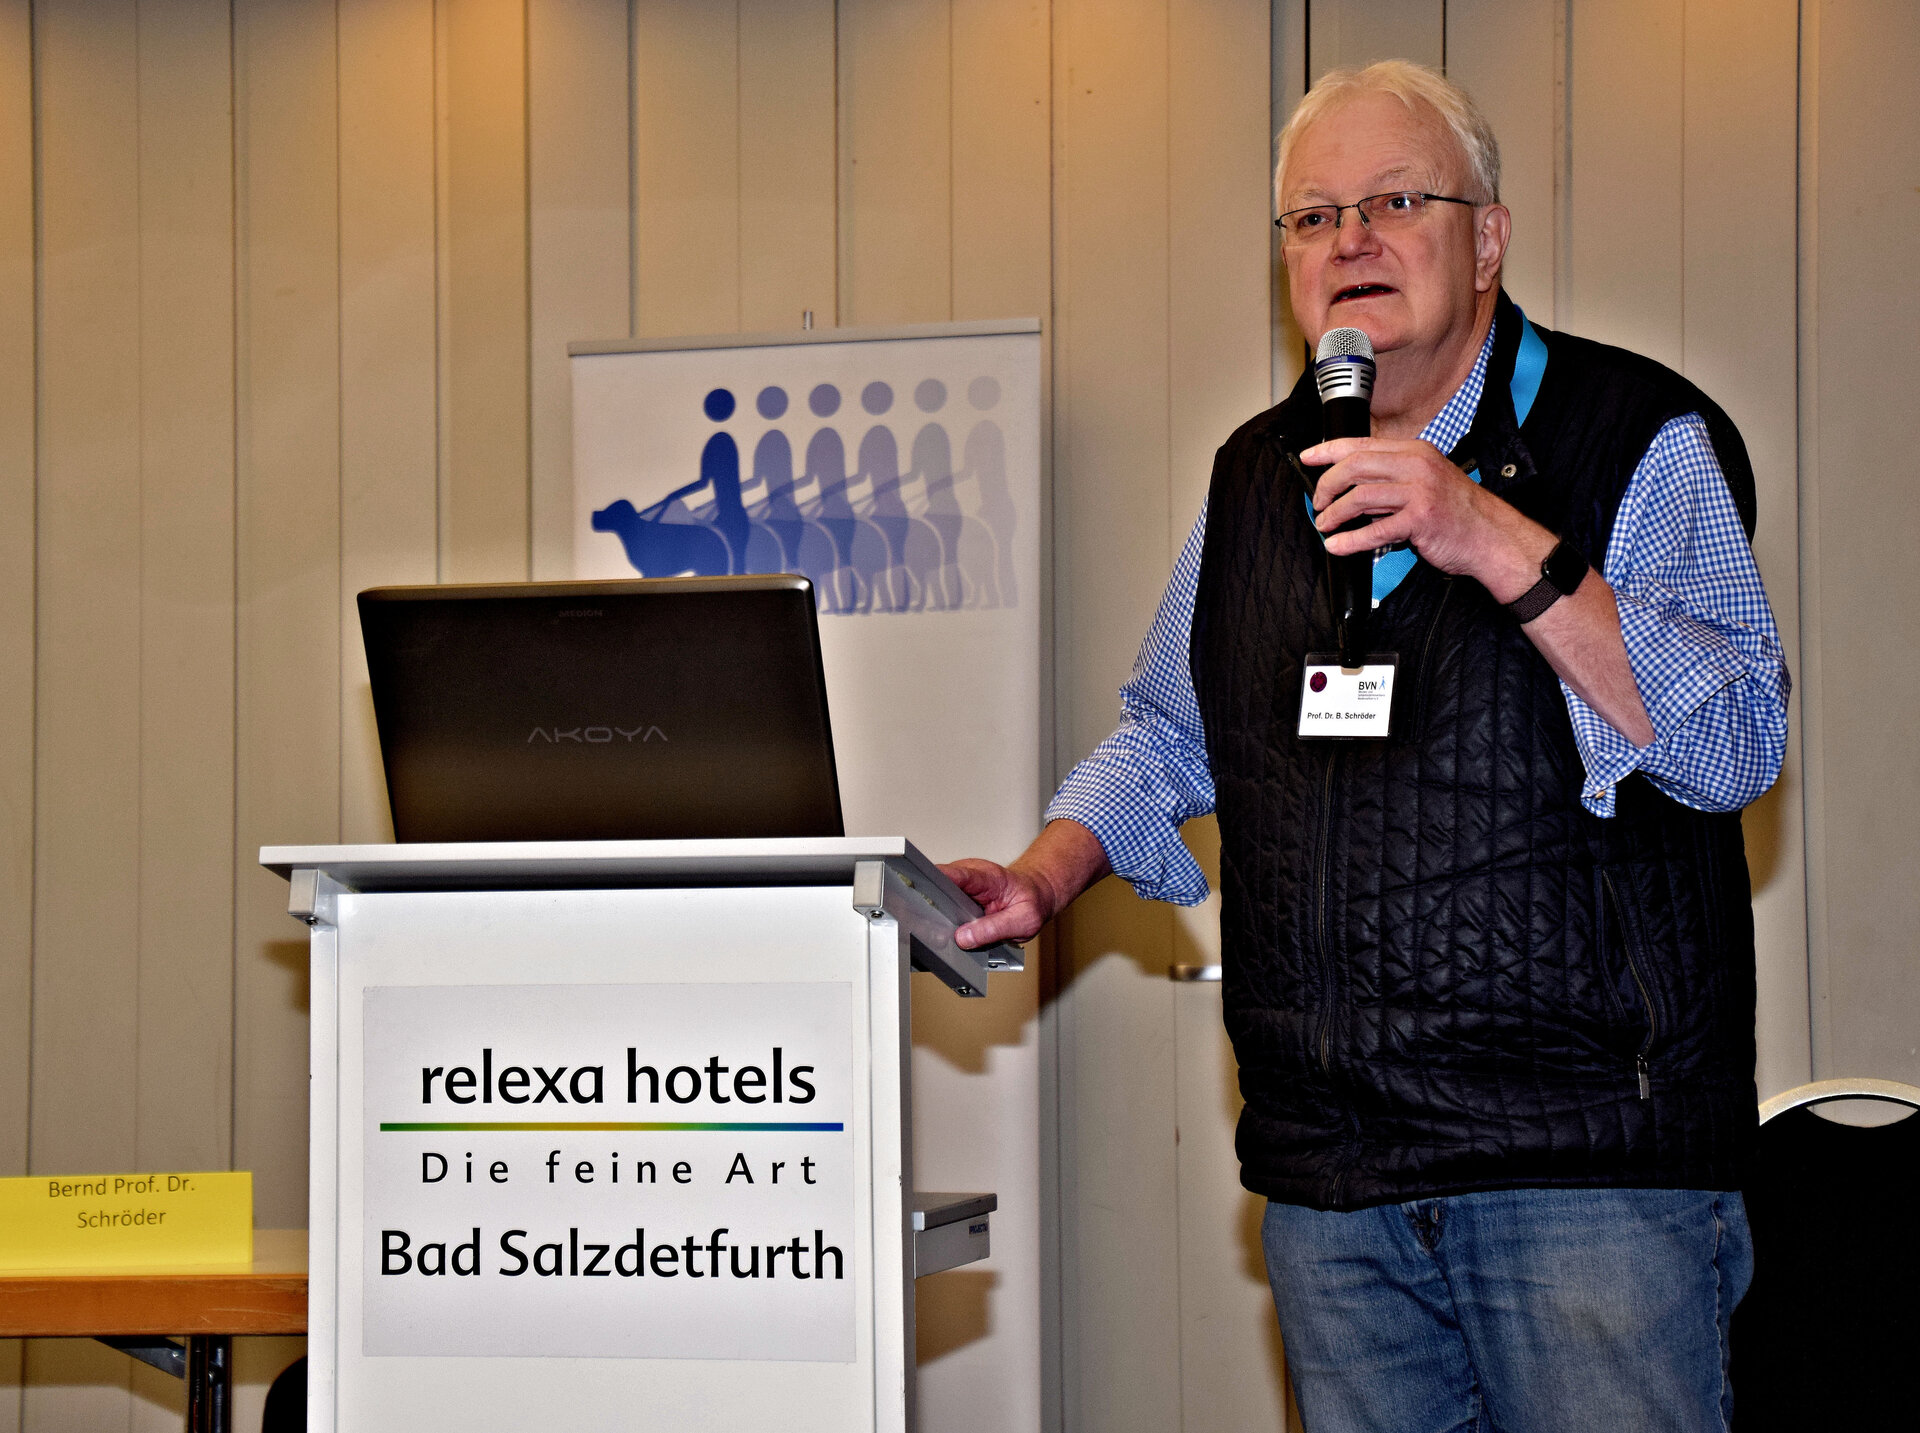 Prof. Bernd Schröder